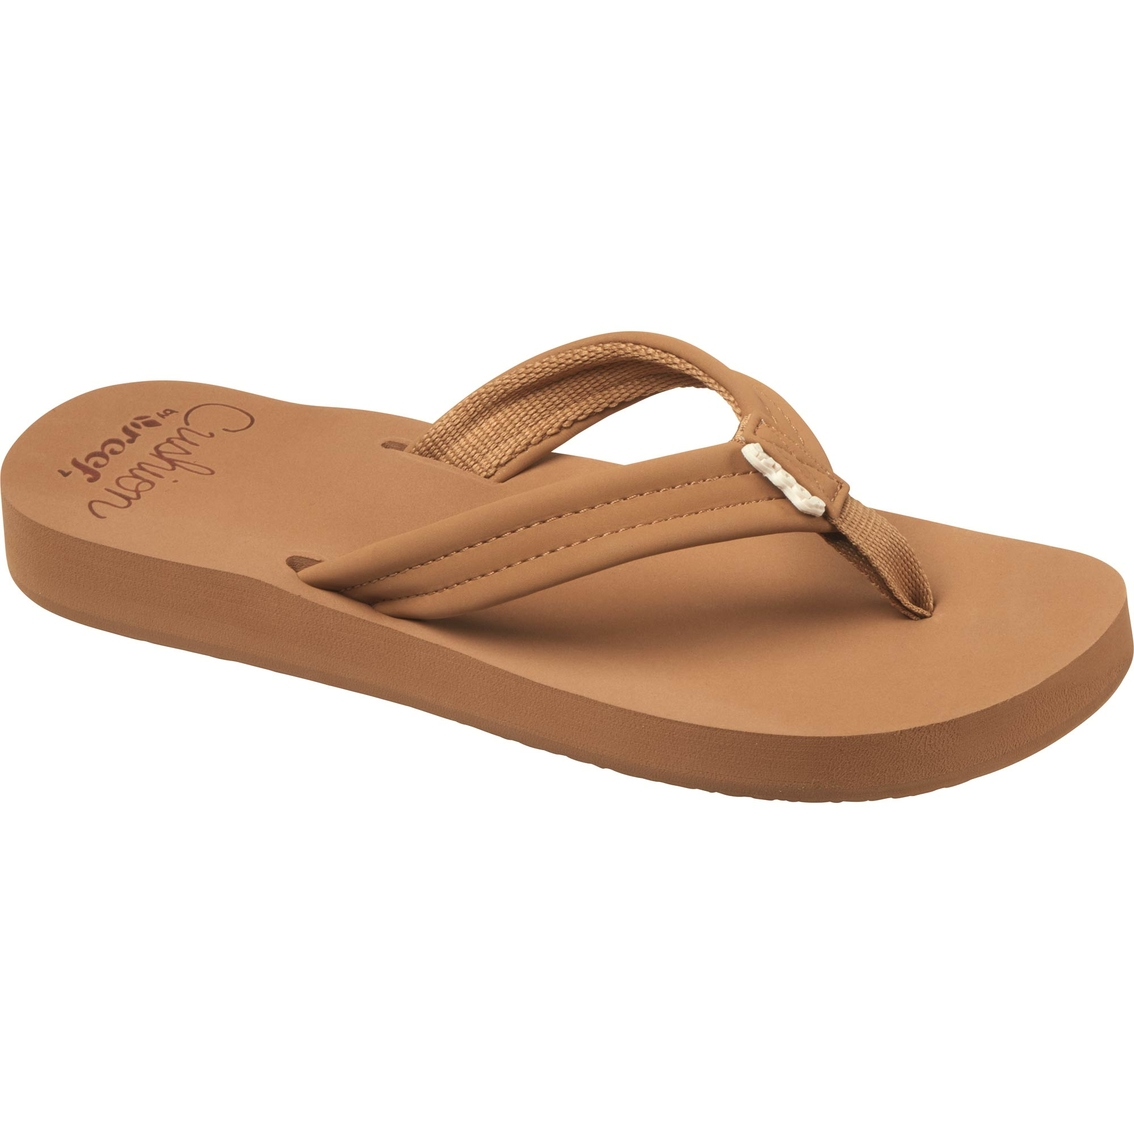 Reef Cushion Breeze Flip Flop Sandals